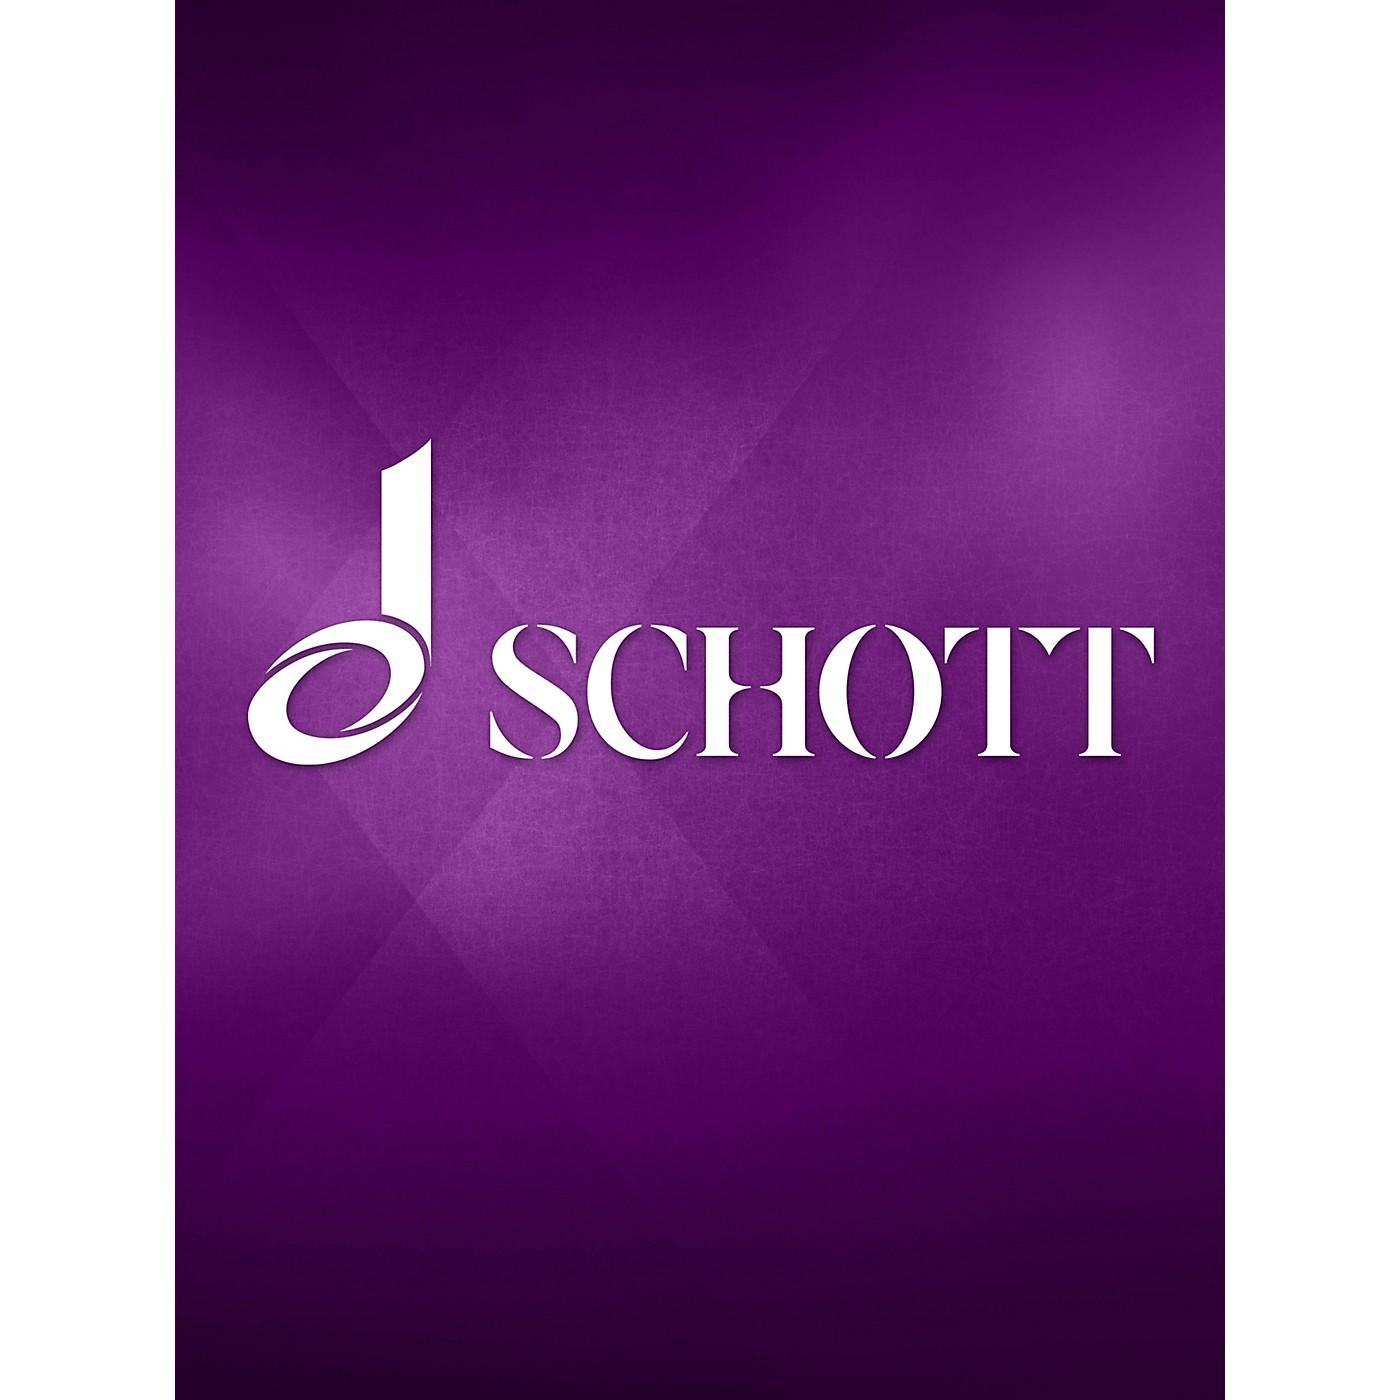 Eulenburg Piano Trio, Op. 100, D. 929 in E-Flat Major (Study Score) Schott Series Composed by Franz Schubert thumbnail